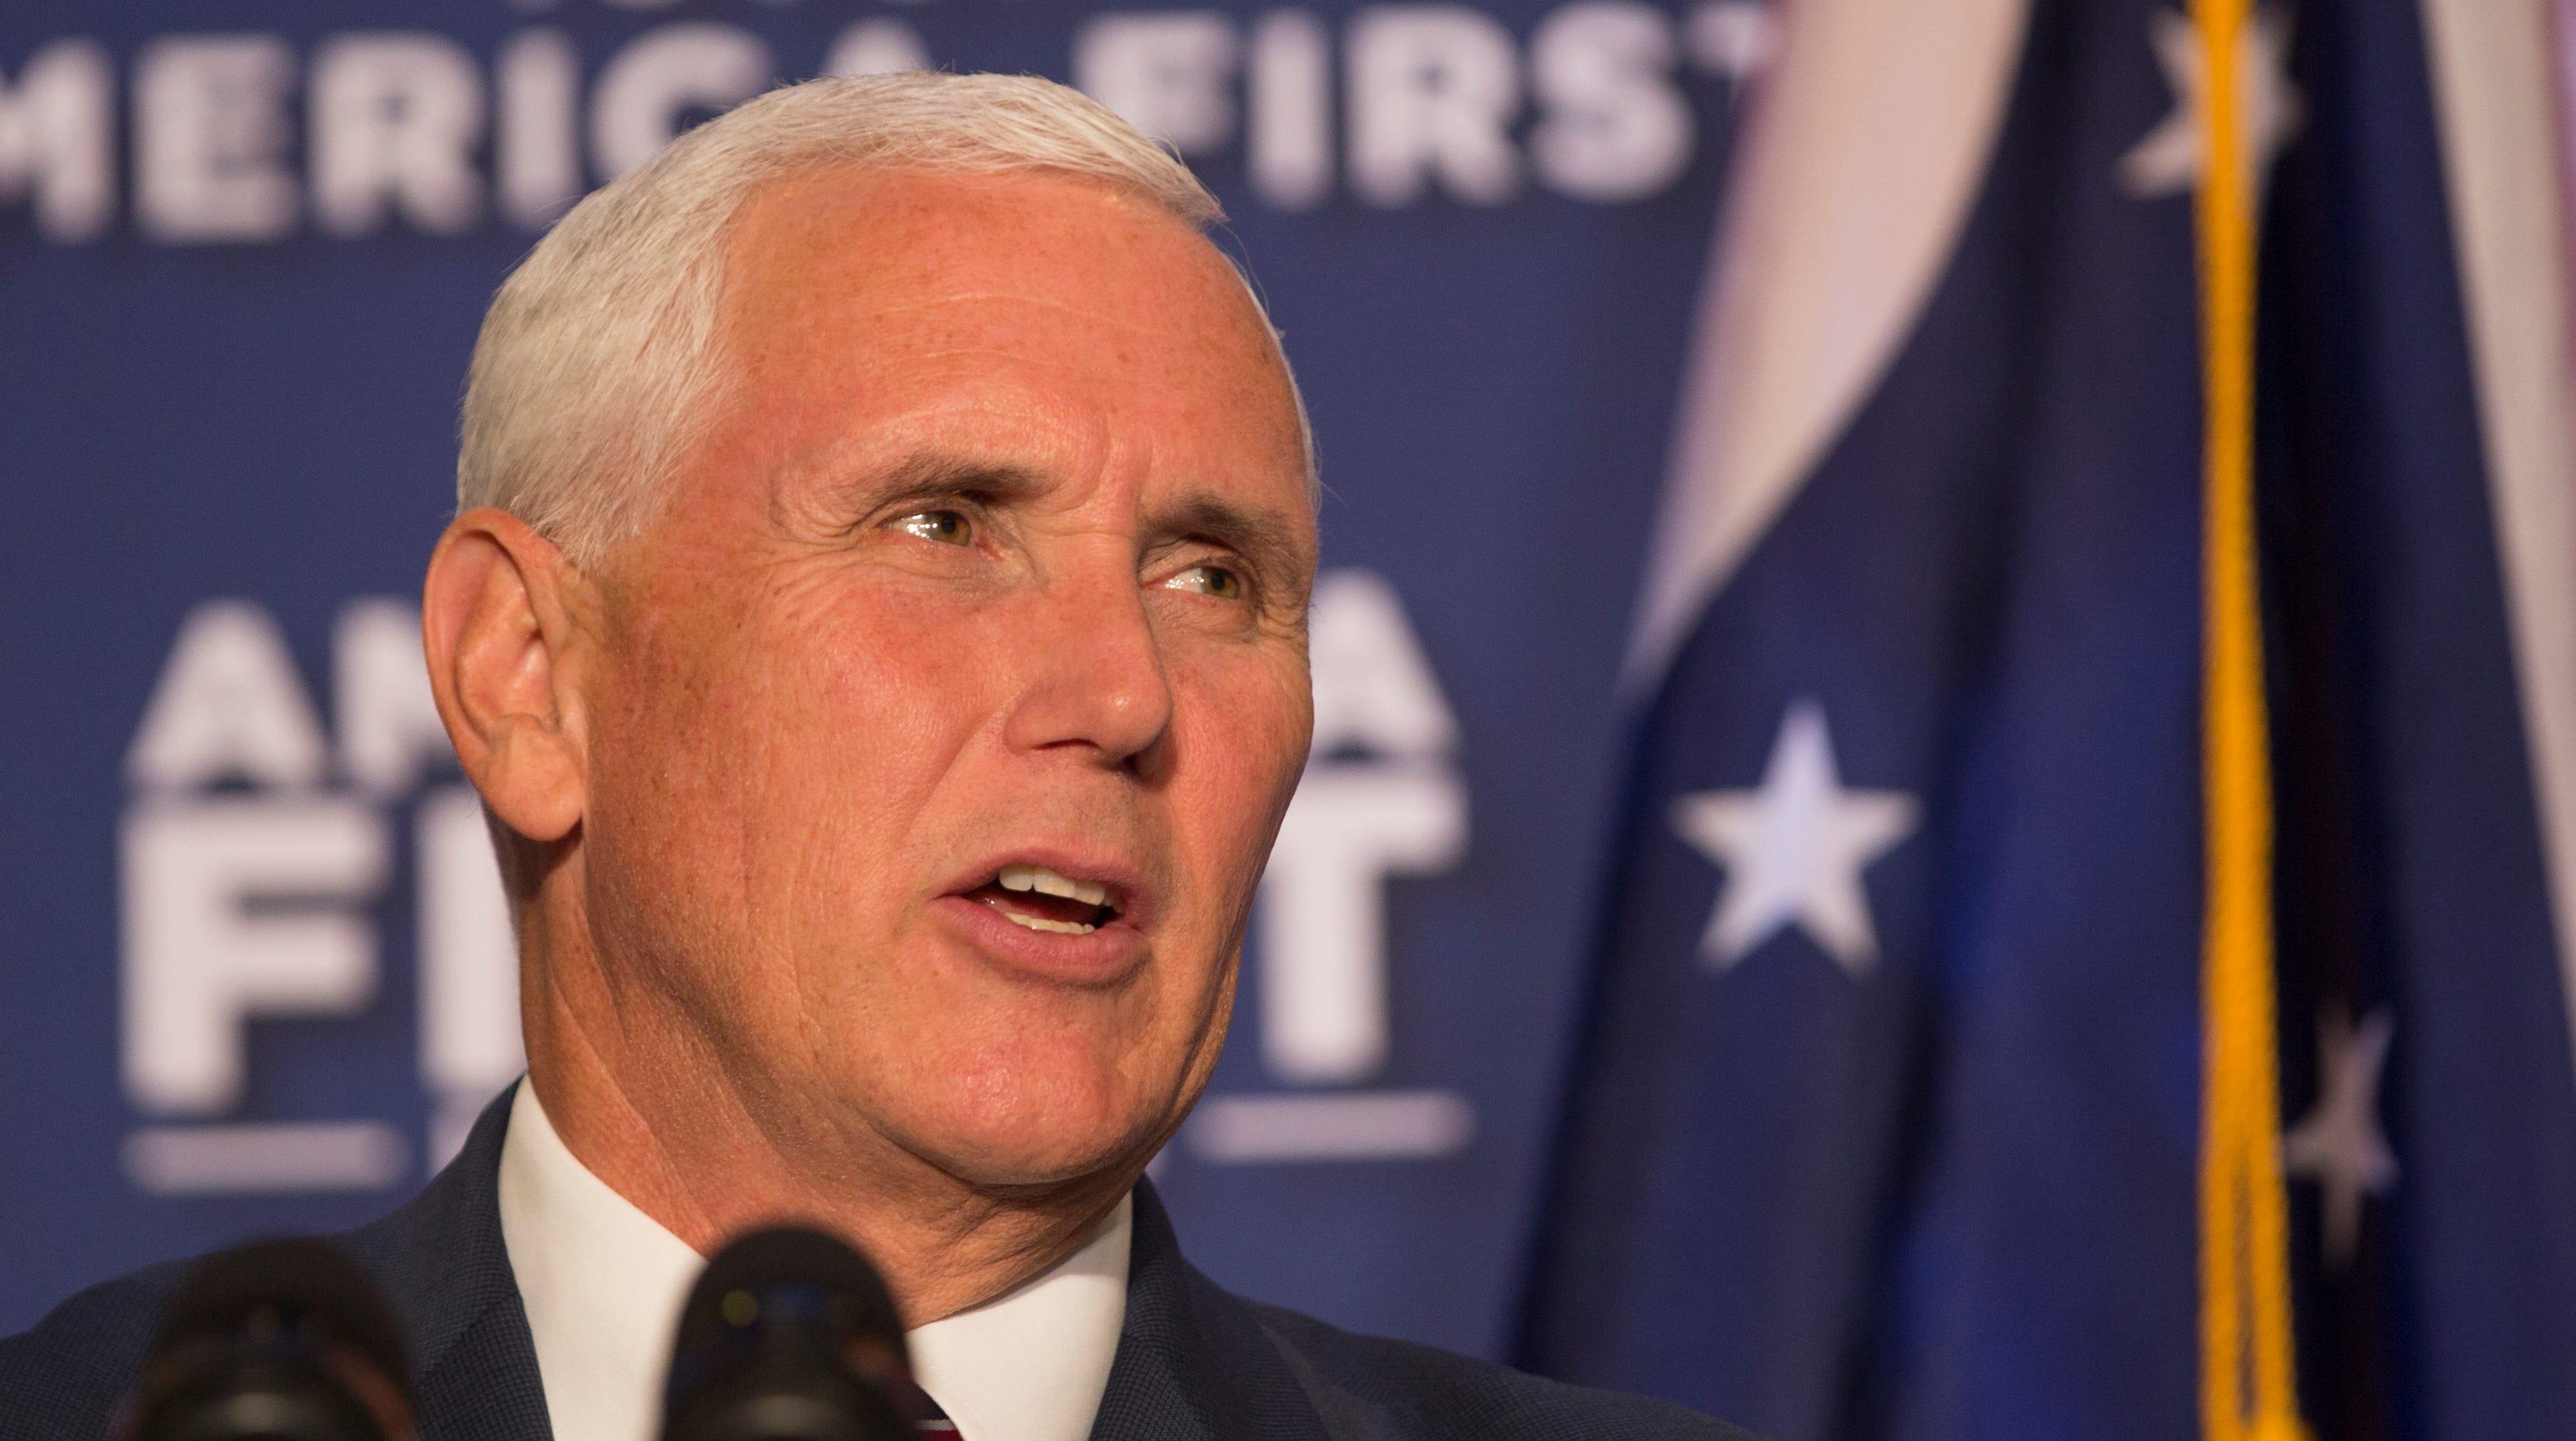 In Cincinnati speech, Vice President Mike Pence talks taxes and Trump, but not Omarosa